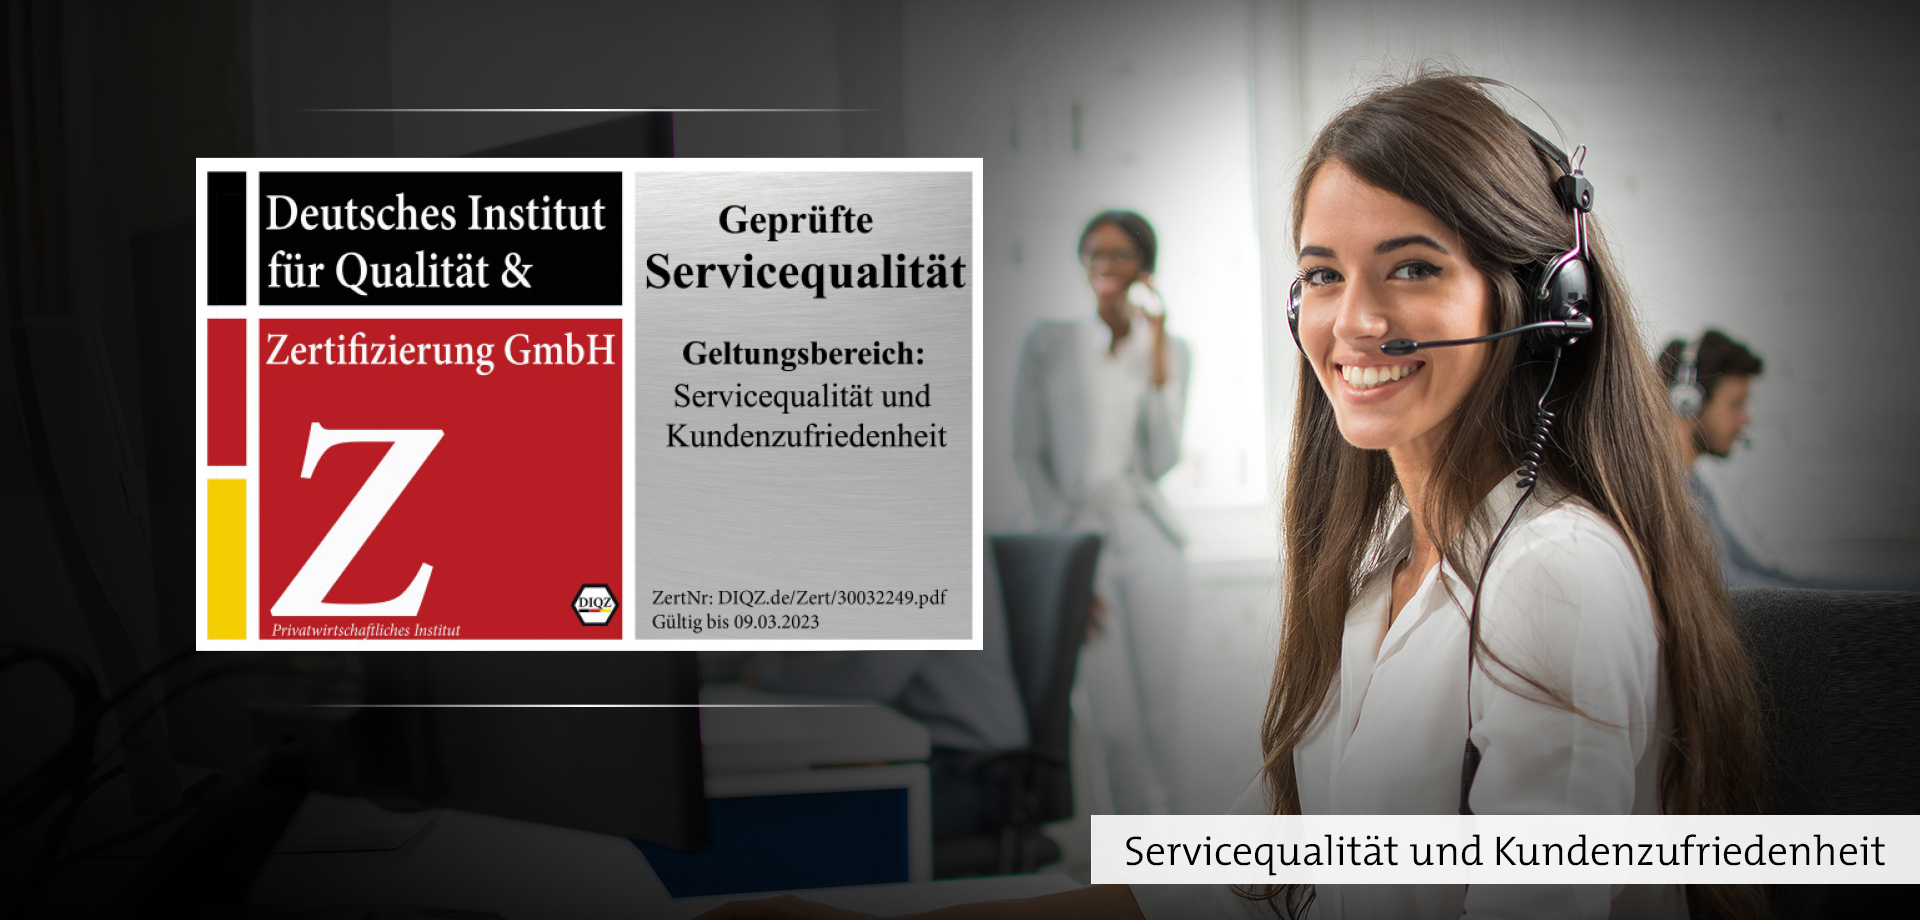 Servicequalitaet